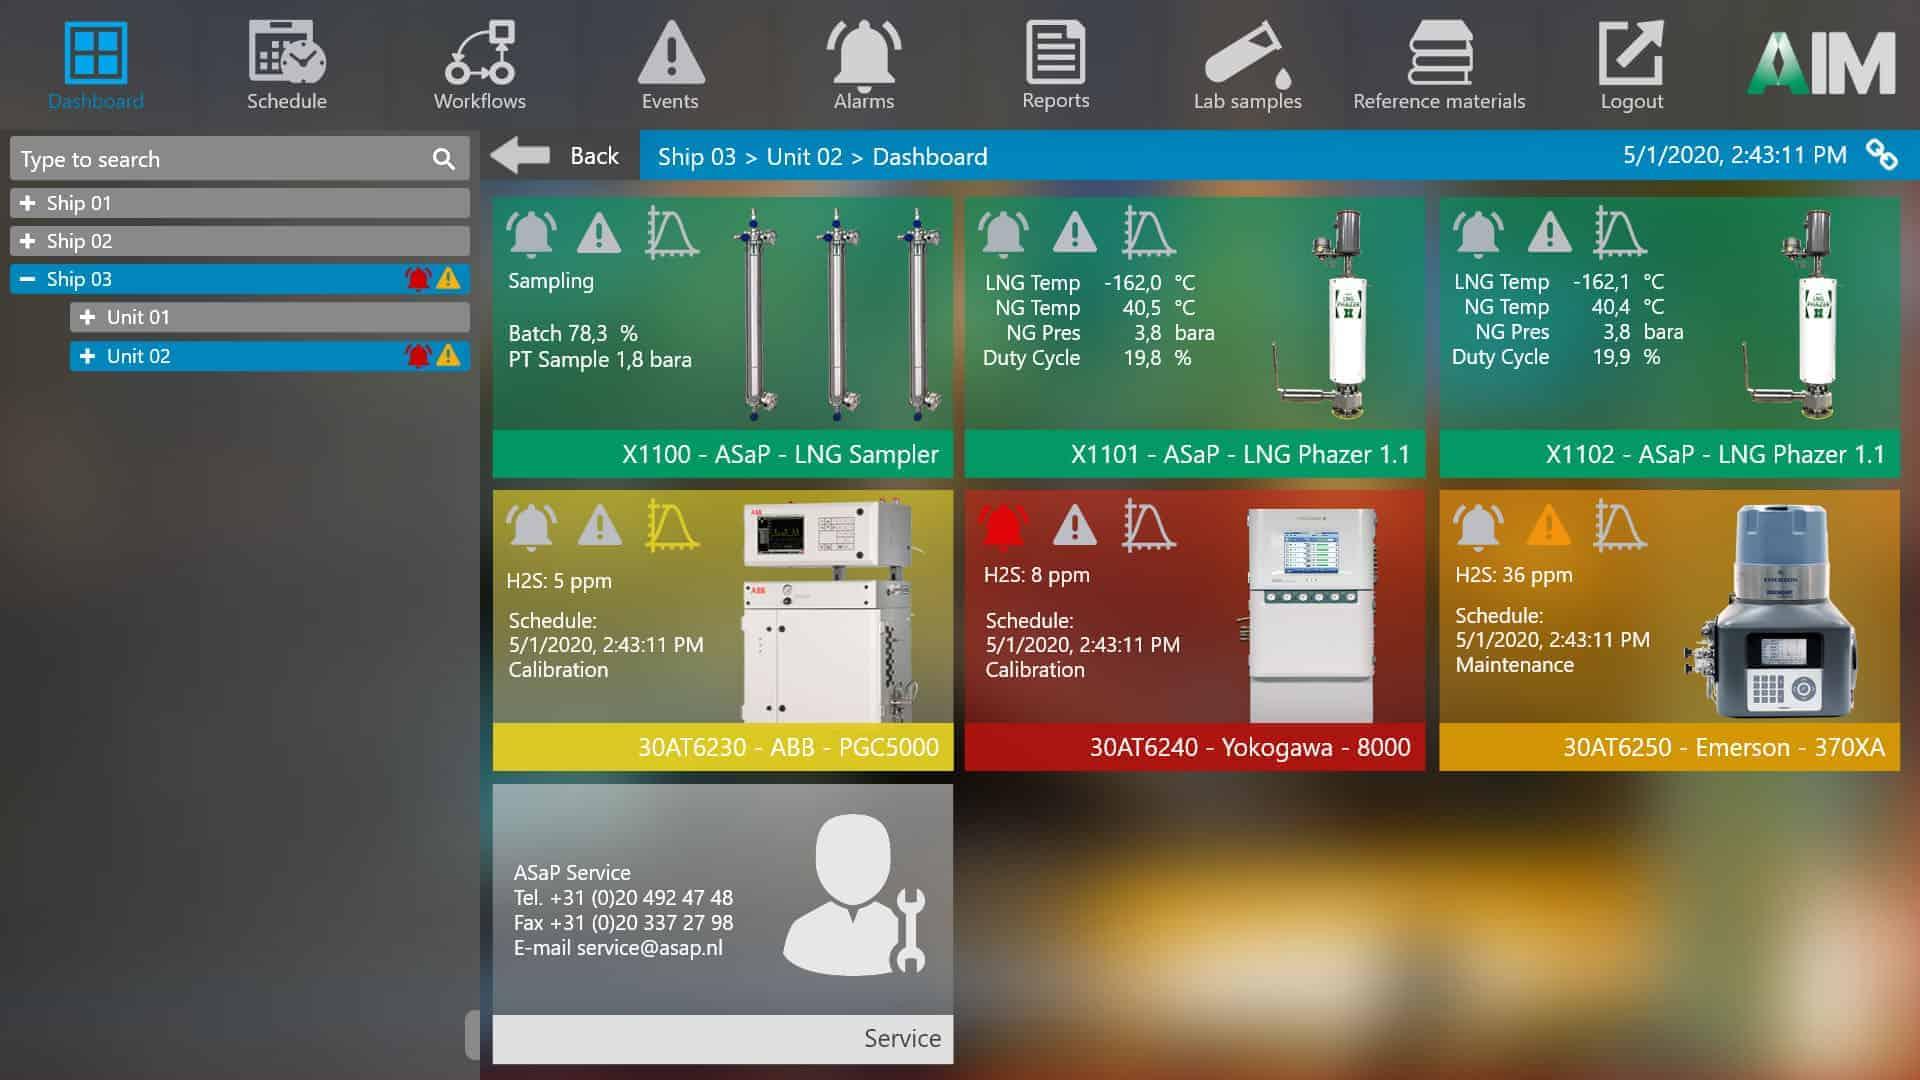 AIM - Predictive maintenance & analyzer data collection software - Dashboard